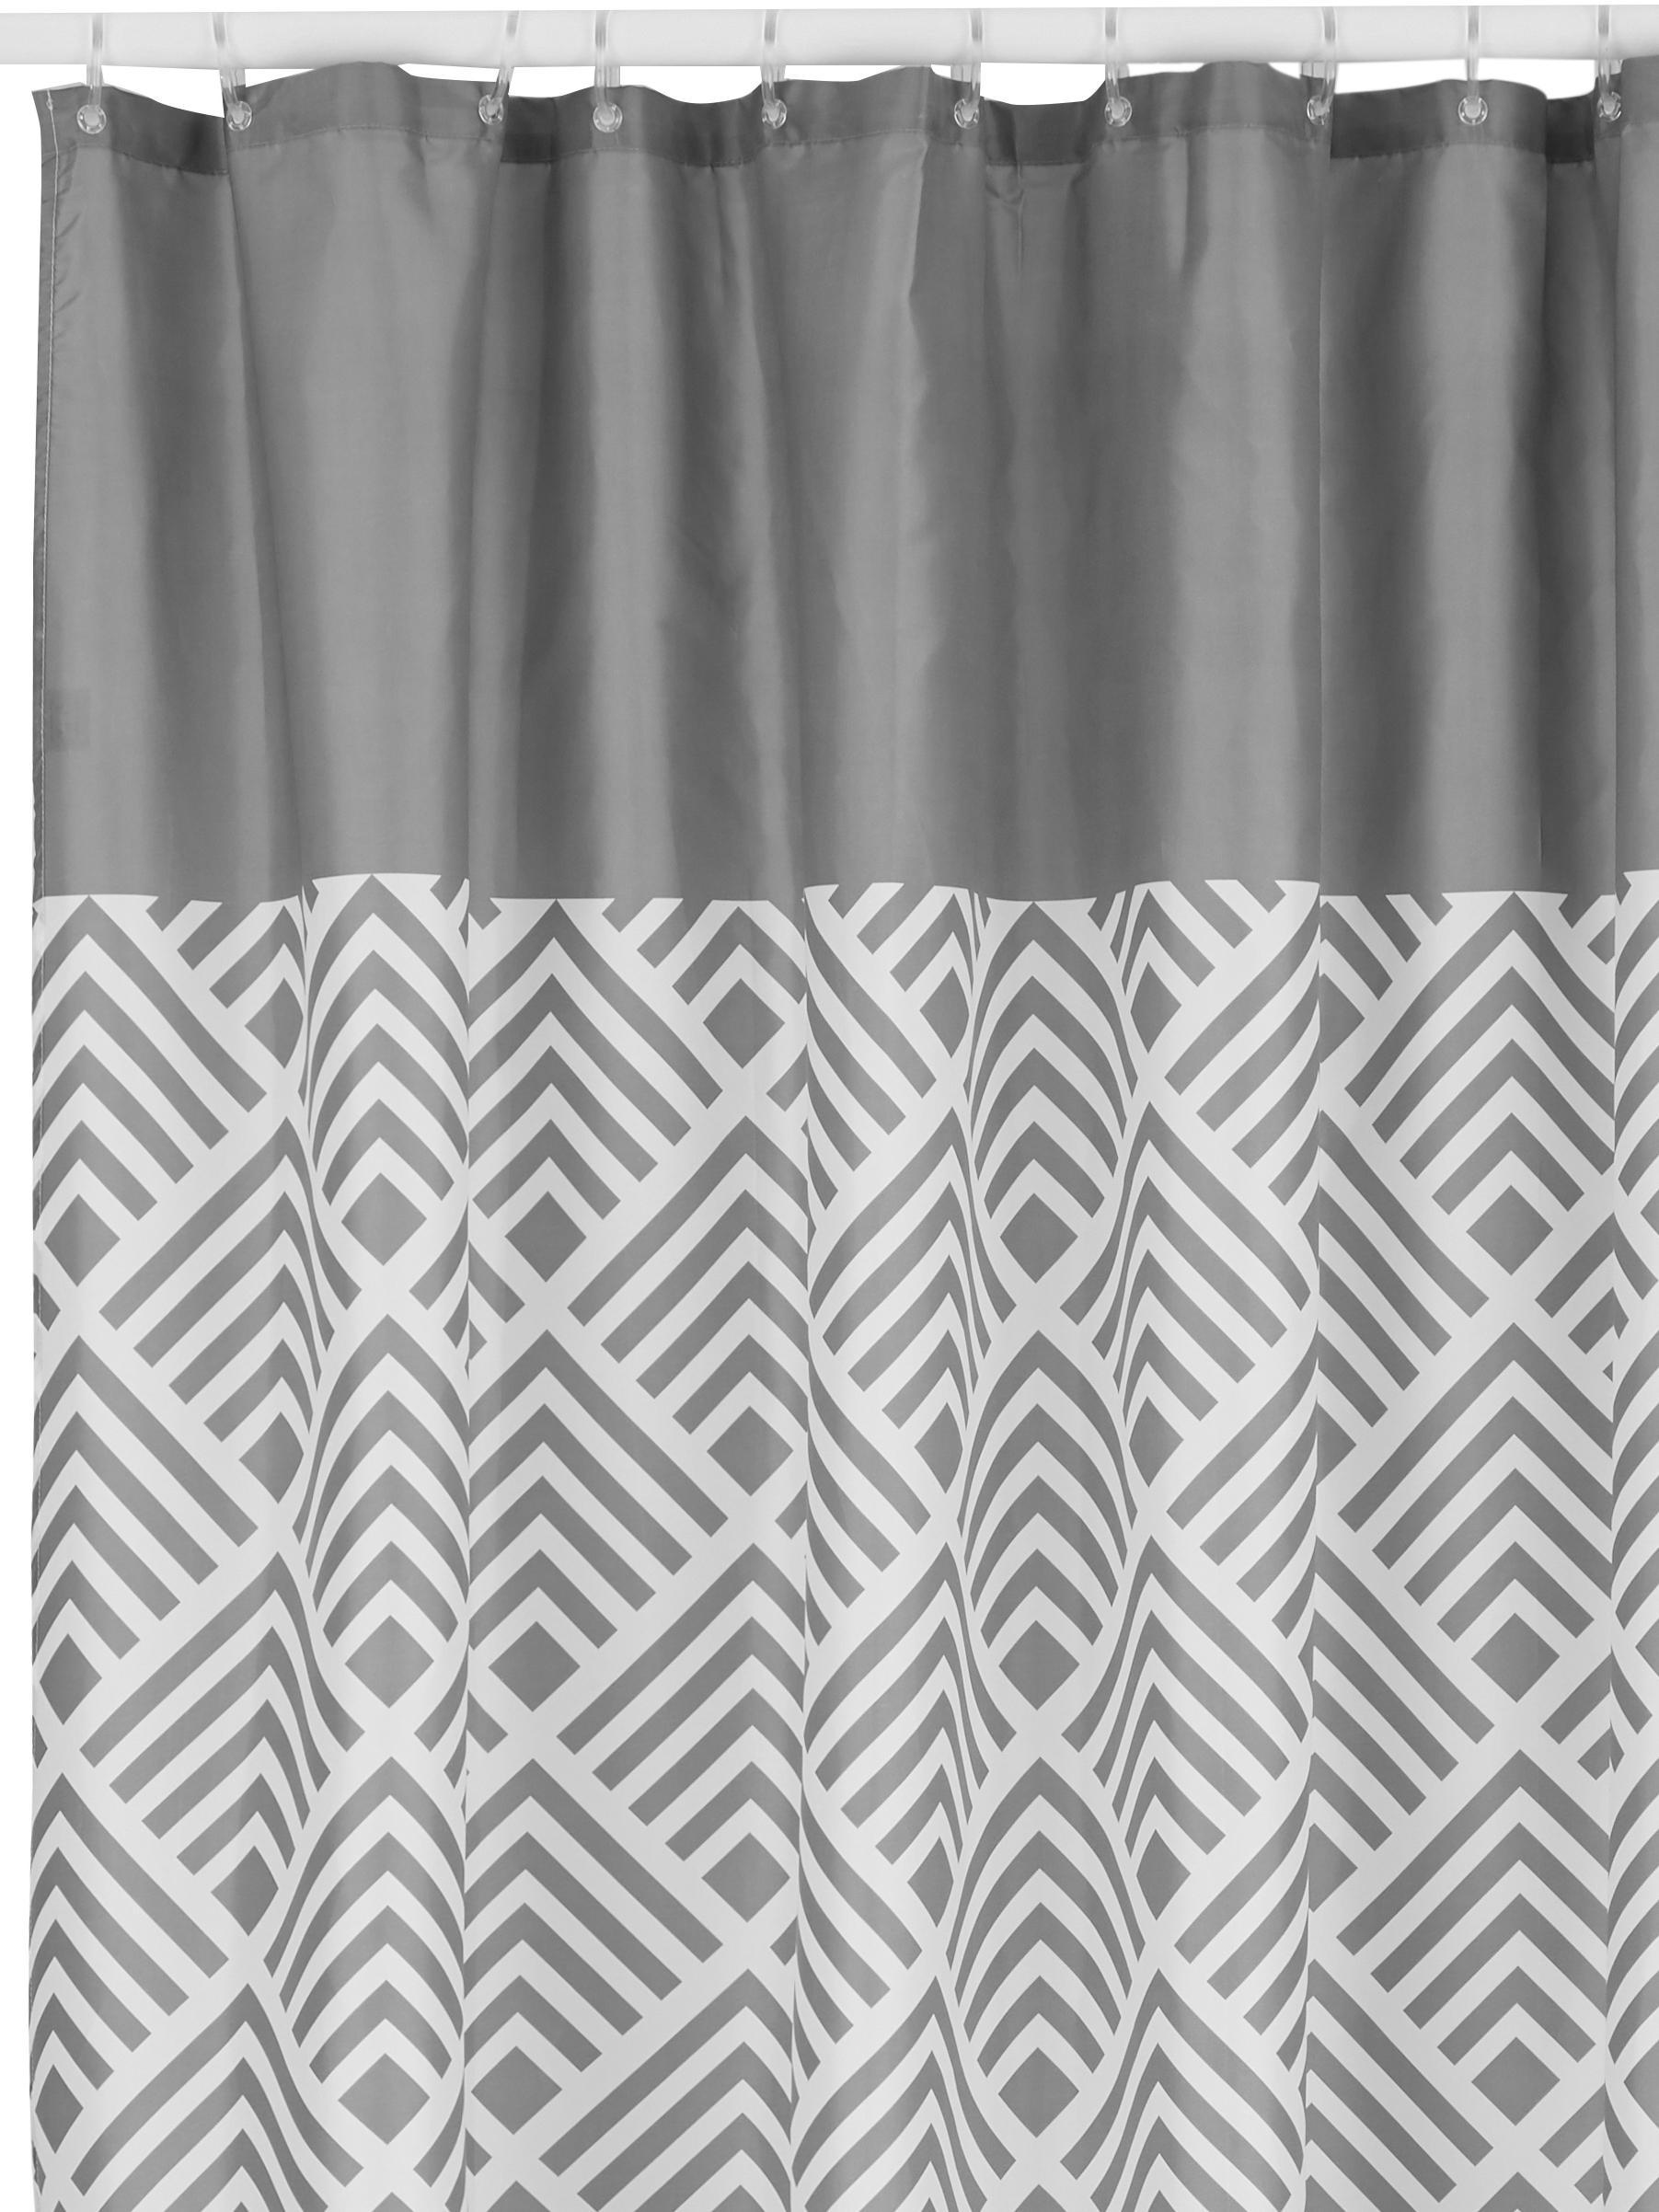 Gemusterter Duschvorhang Allie, Grau, Weiss, 180 x 200 cm